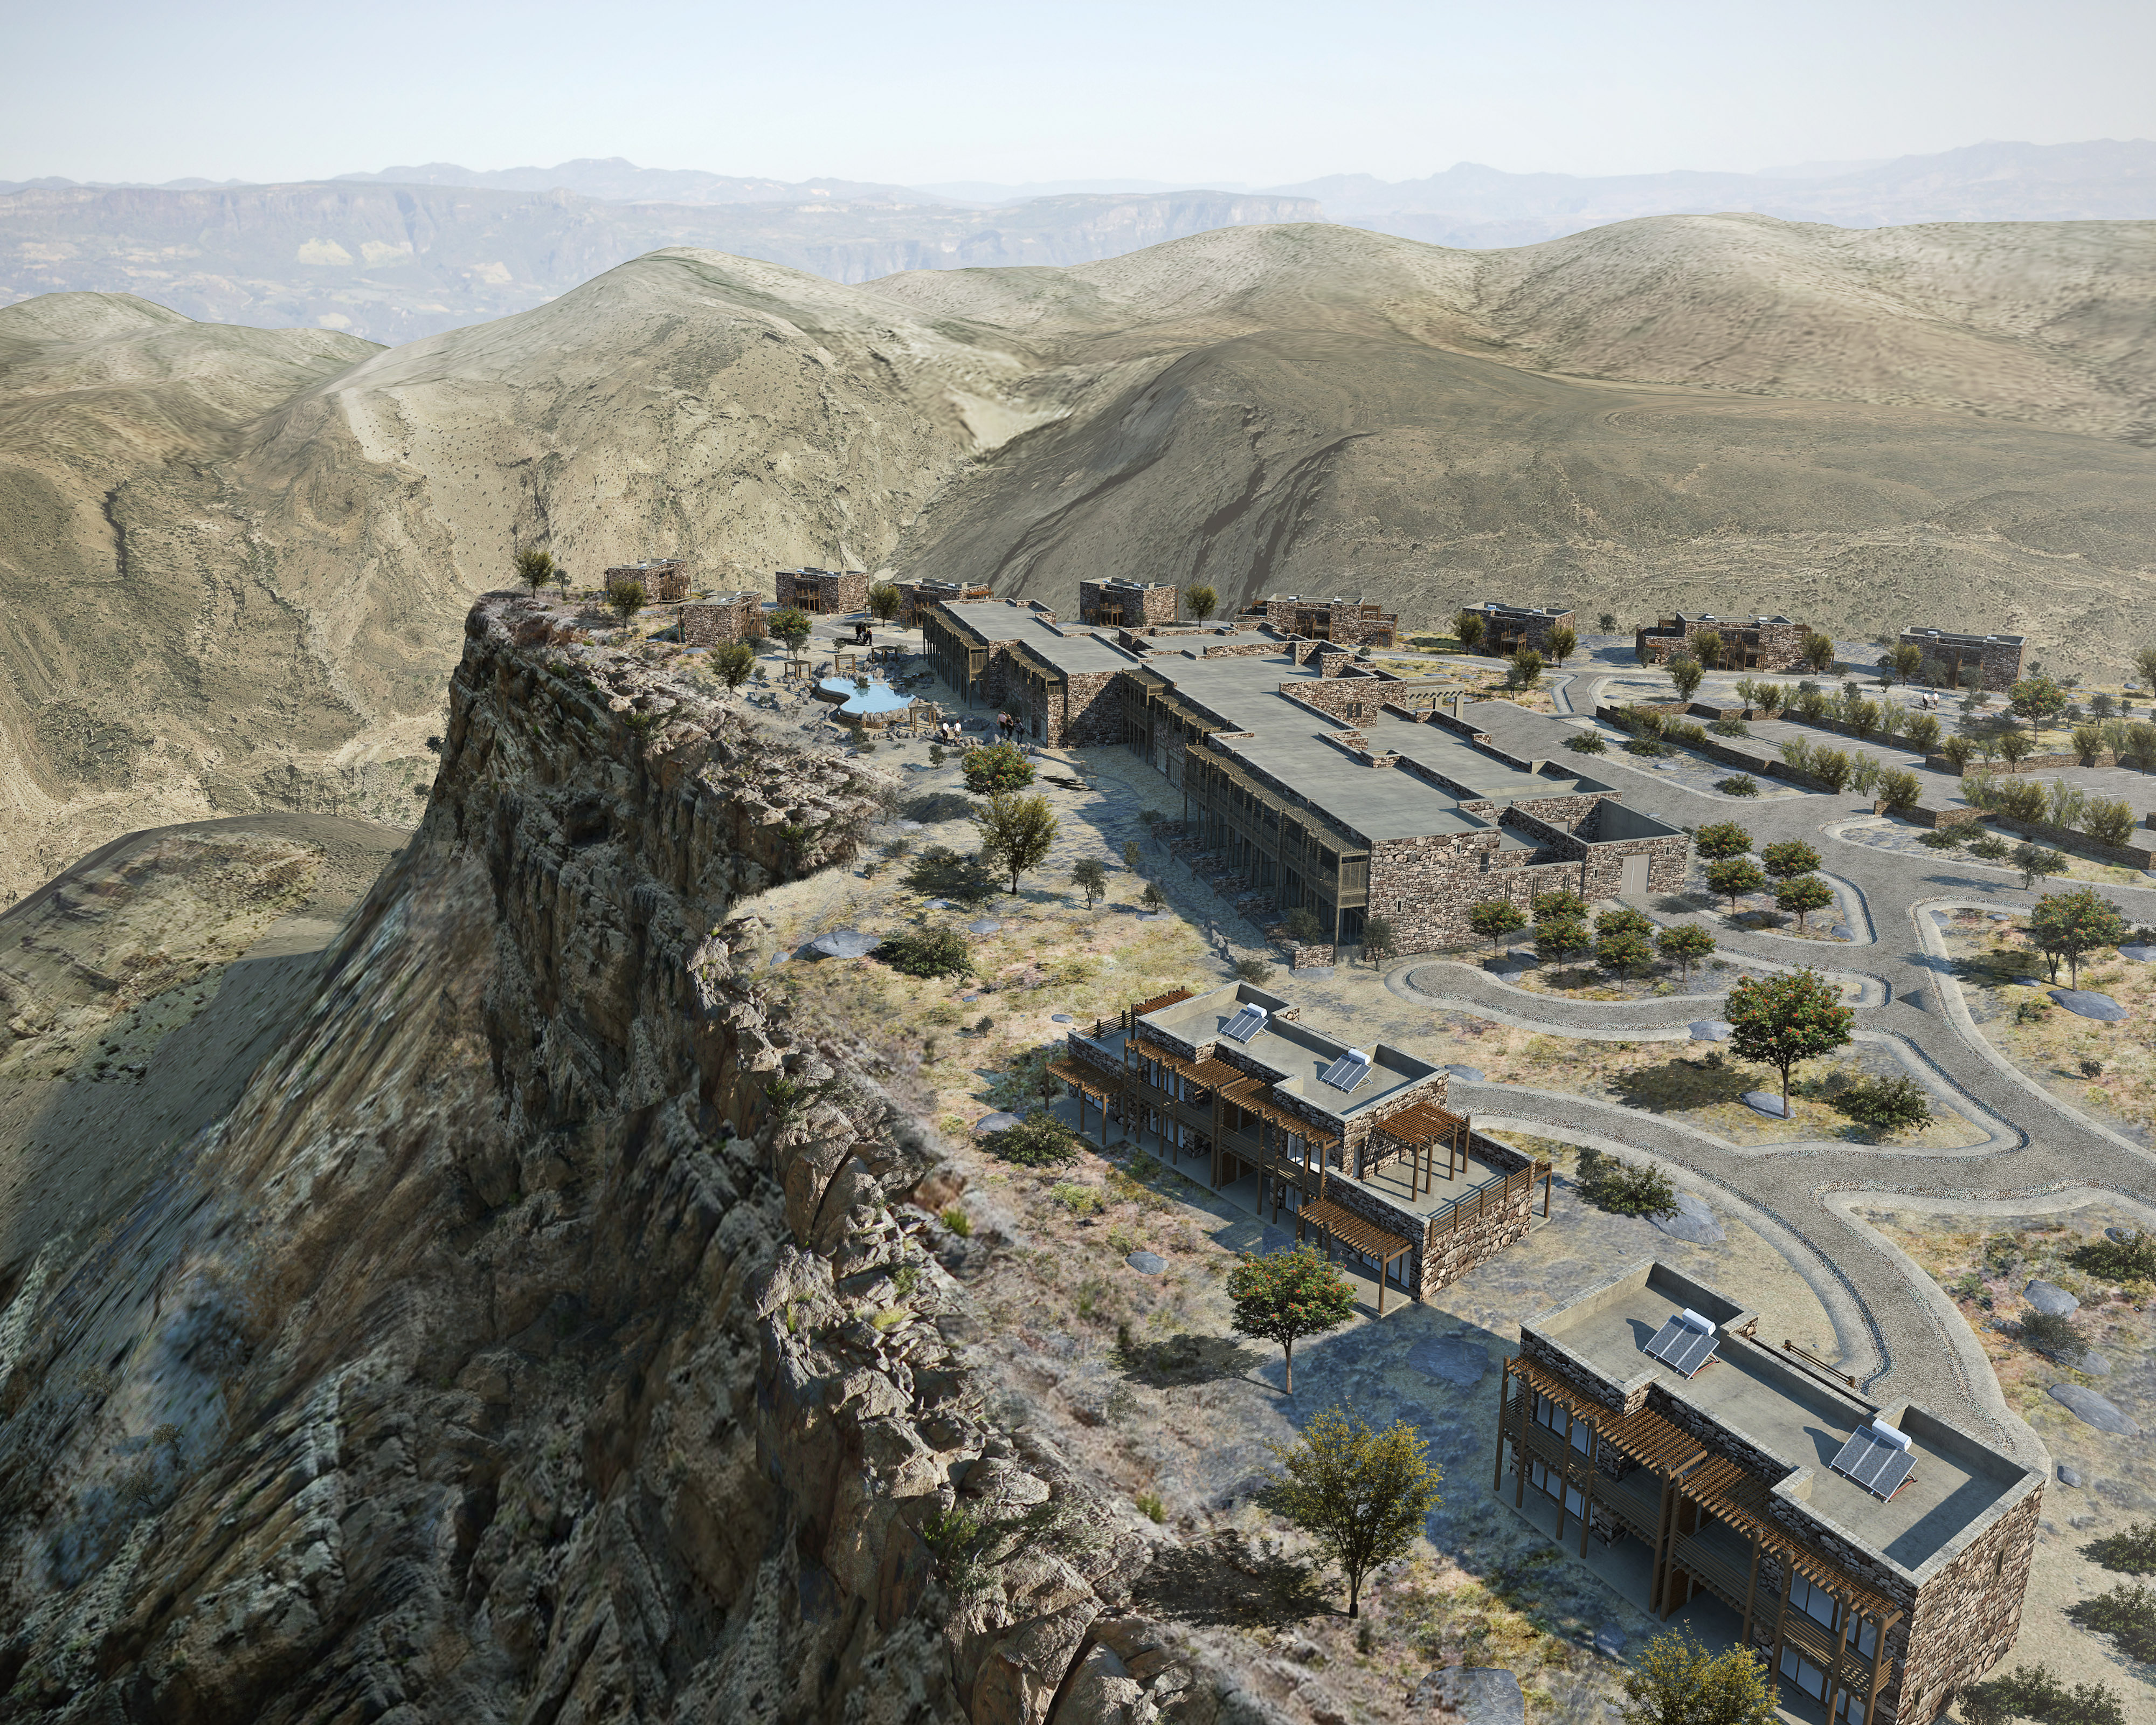 Alila Jabal Akhdar im Oman - Eröffnung ist Anfang 2014